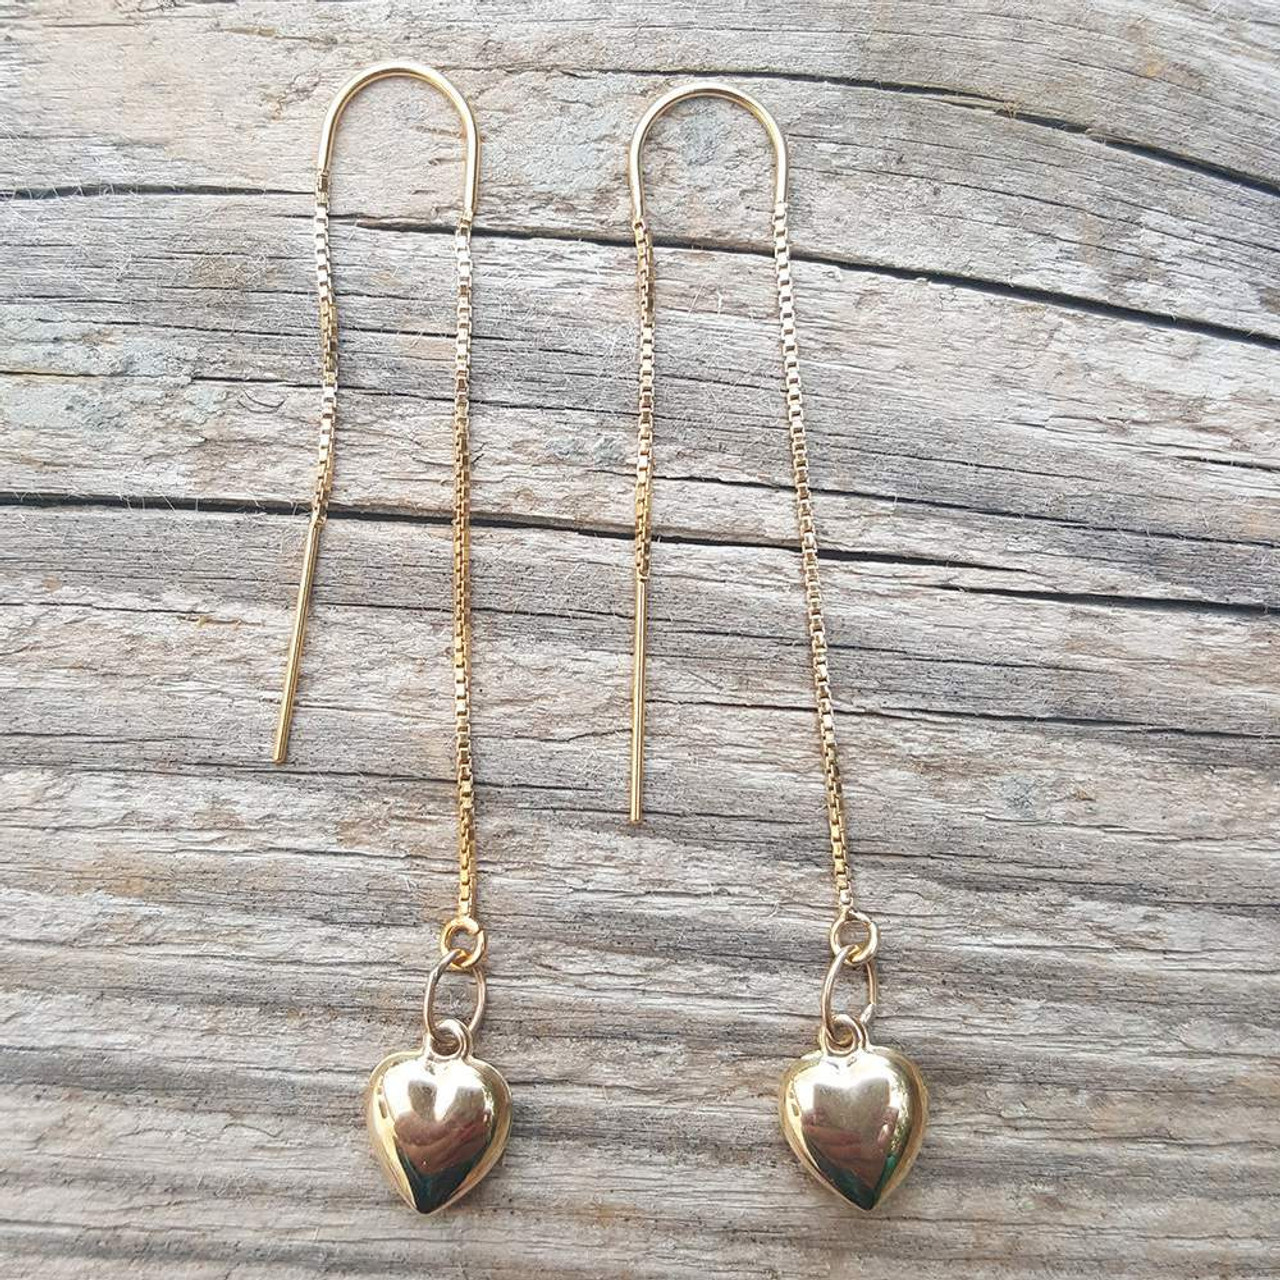 8c2406286f429 Puffy Heart U-Threader Earring 14K Yellow Gold